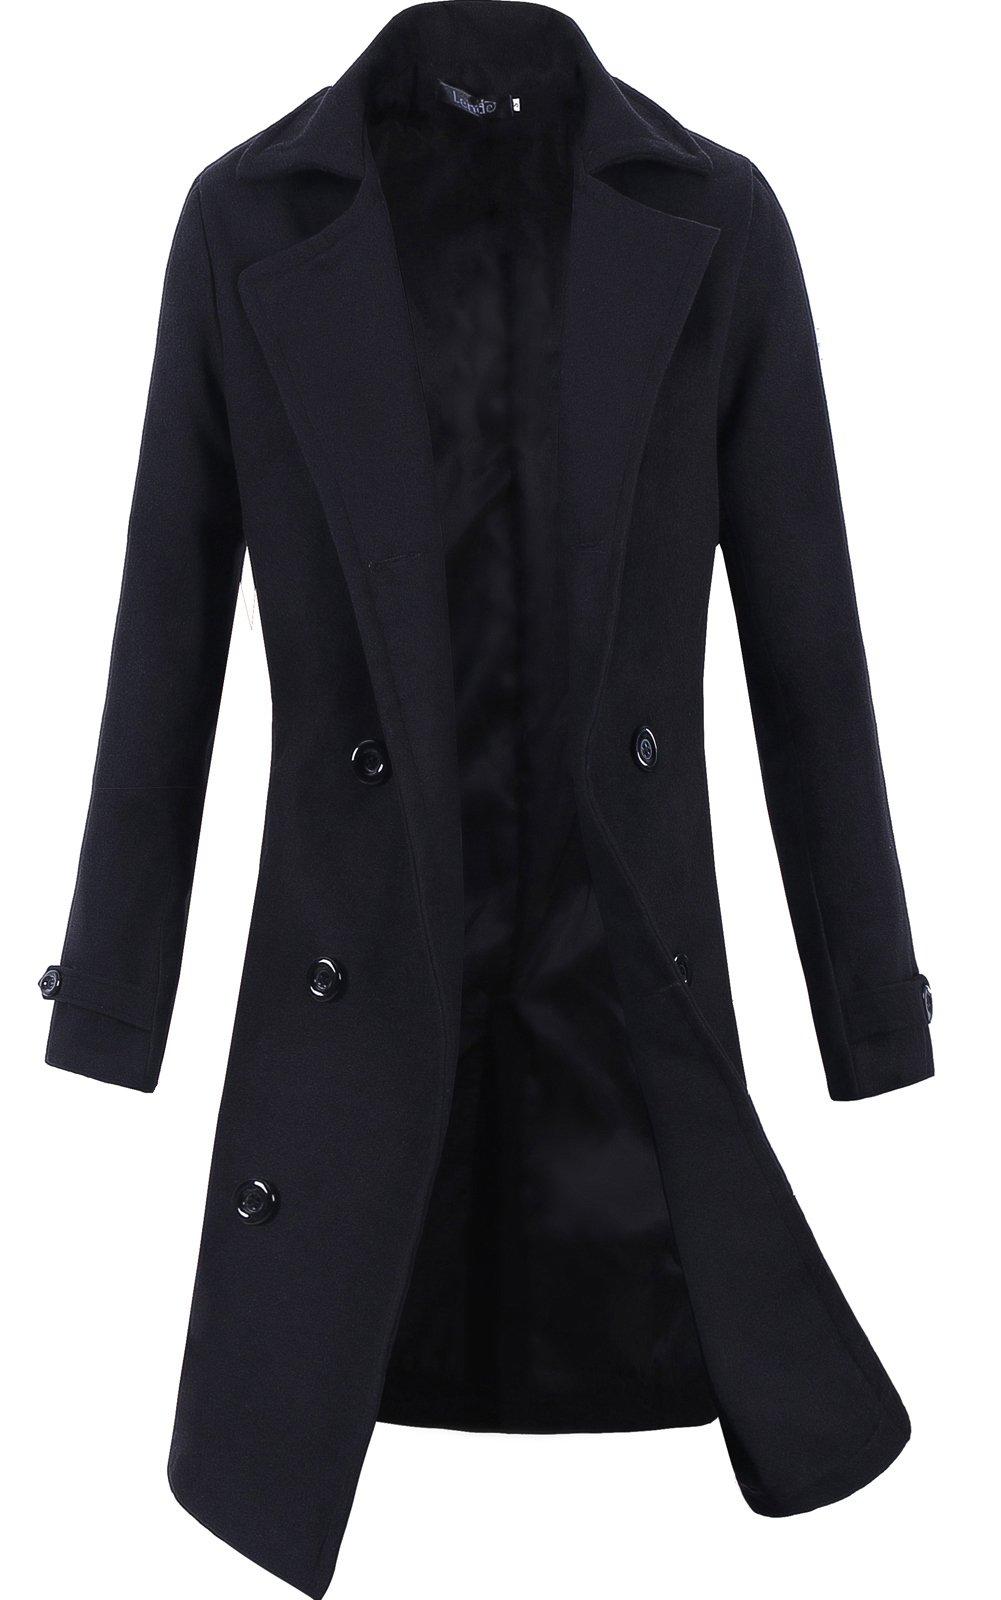 Lende Men's Trench Coat Winter Long Jacket Double Breasted Overcoat Black XL by Lende